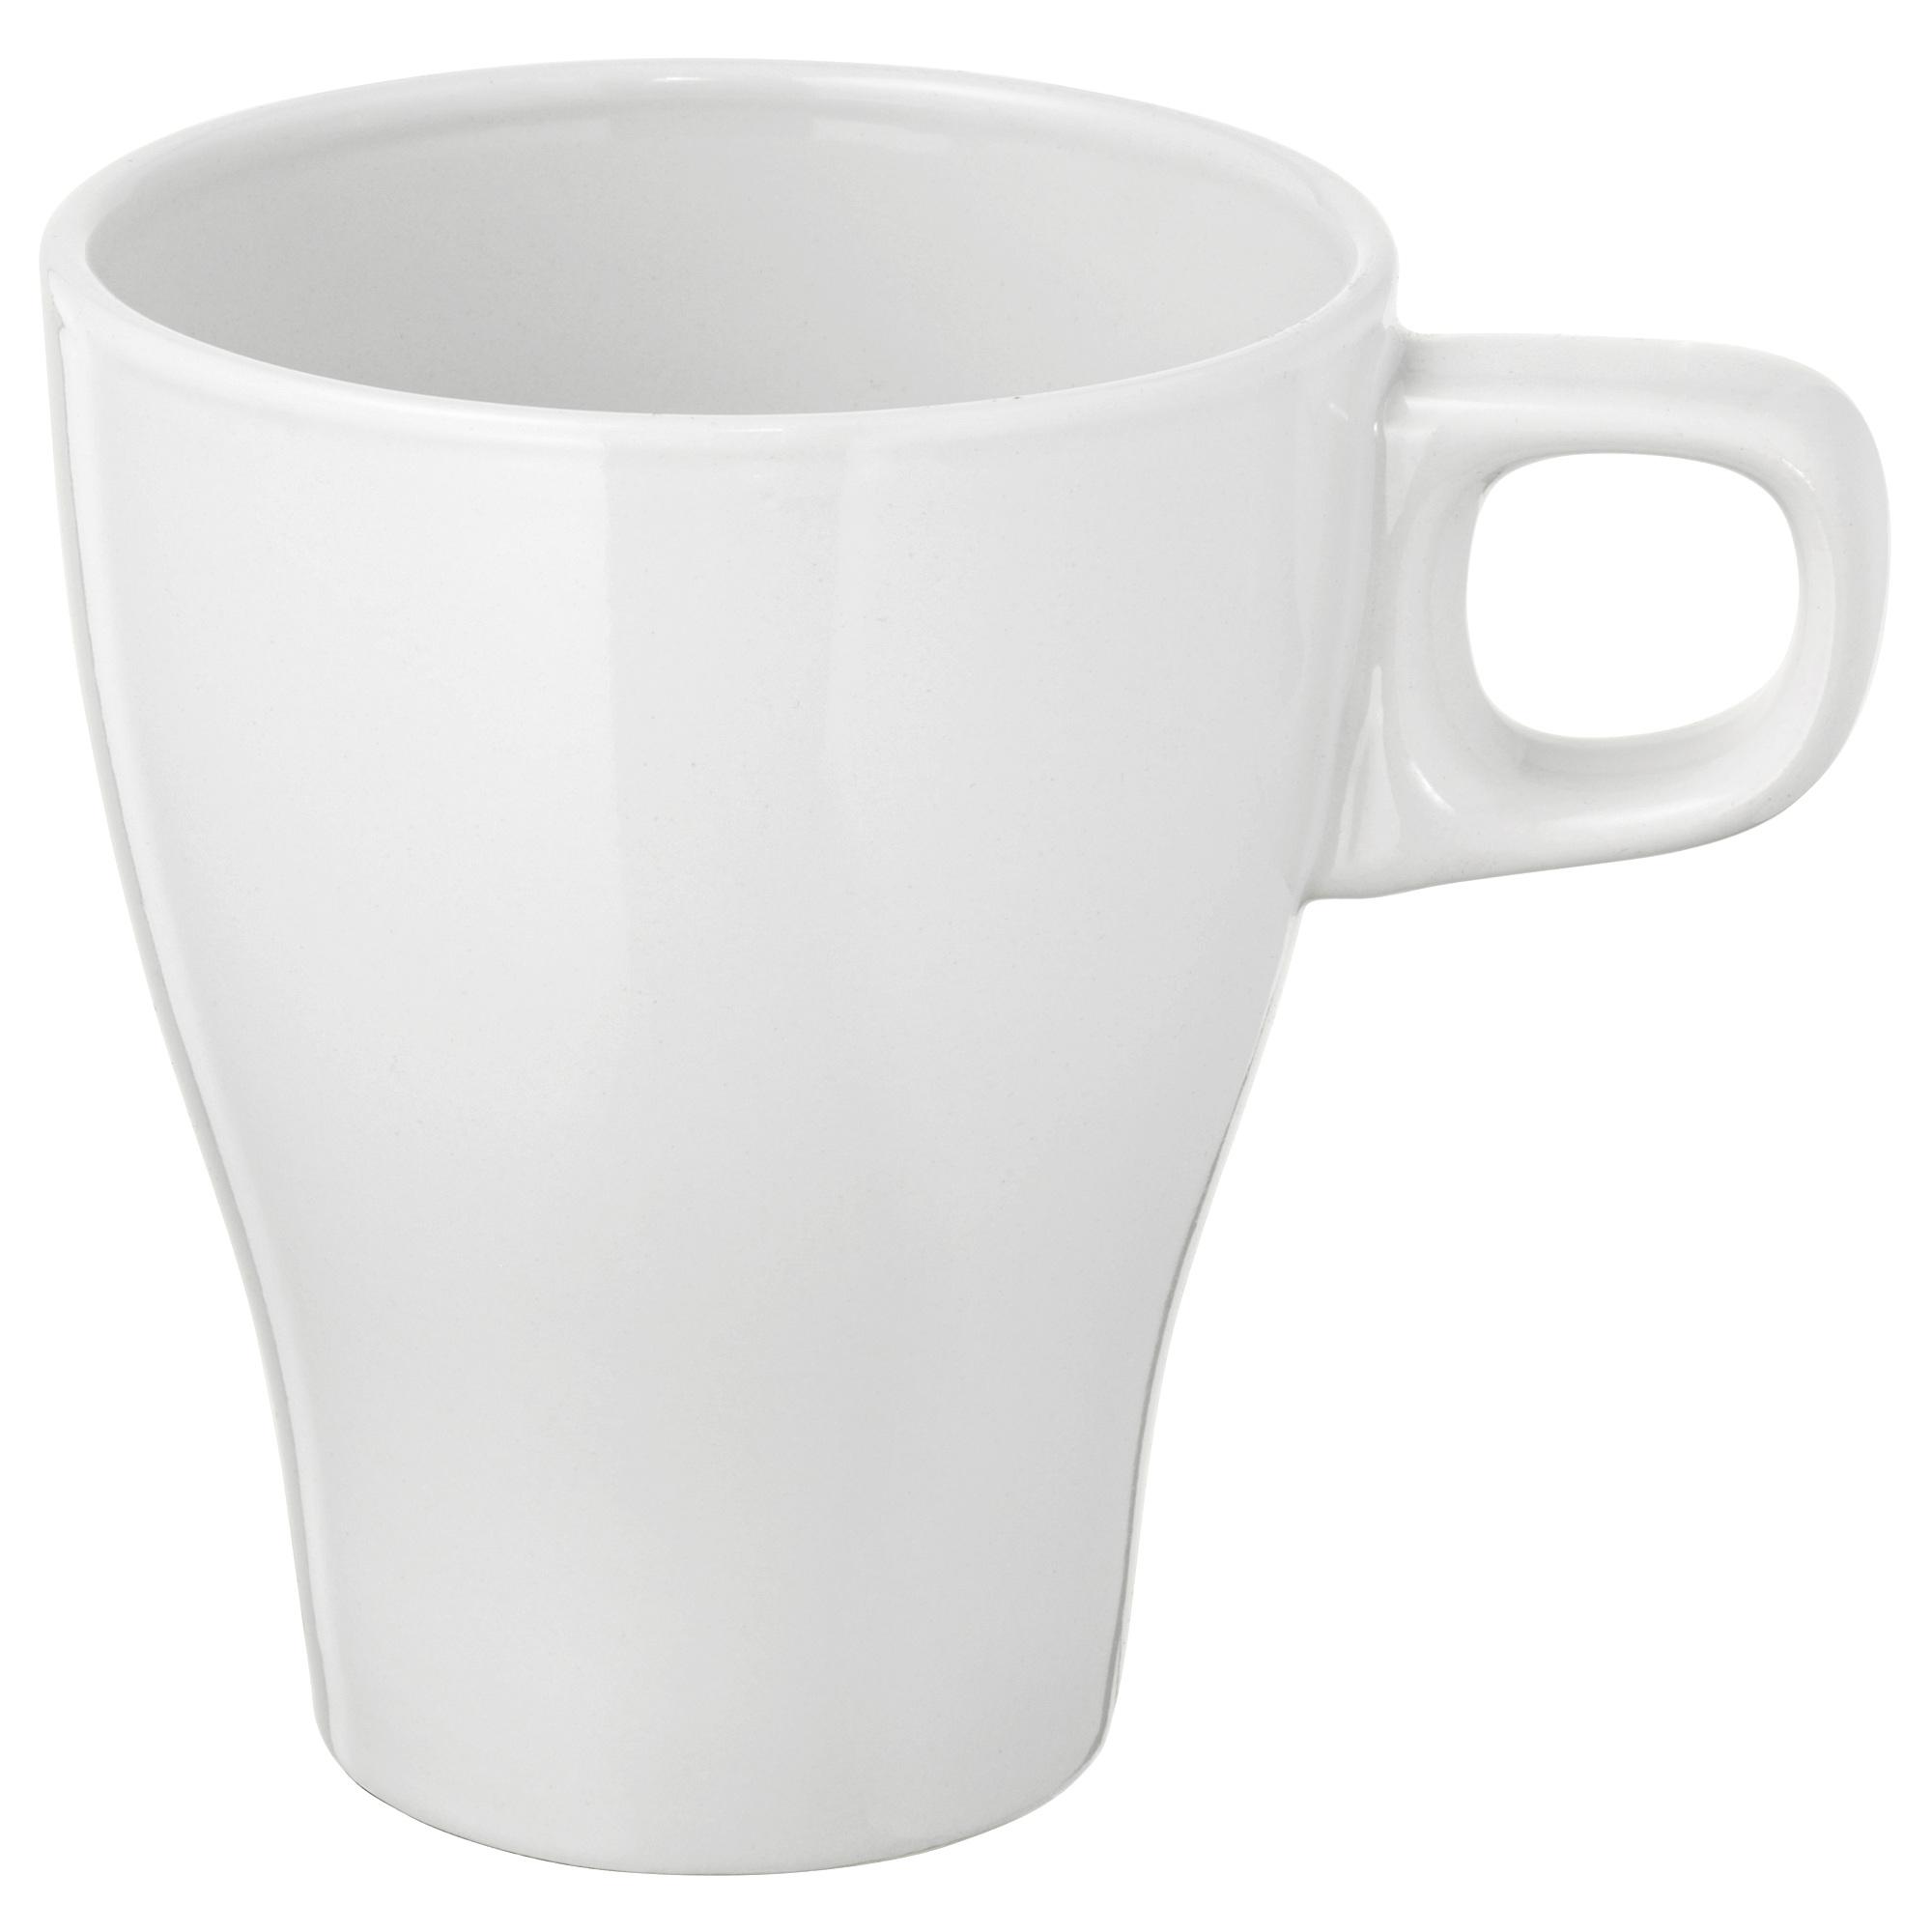 FÄRGRIK mug white 8oz